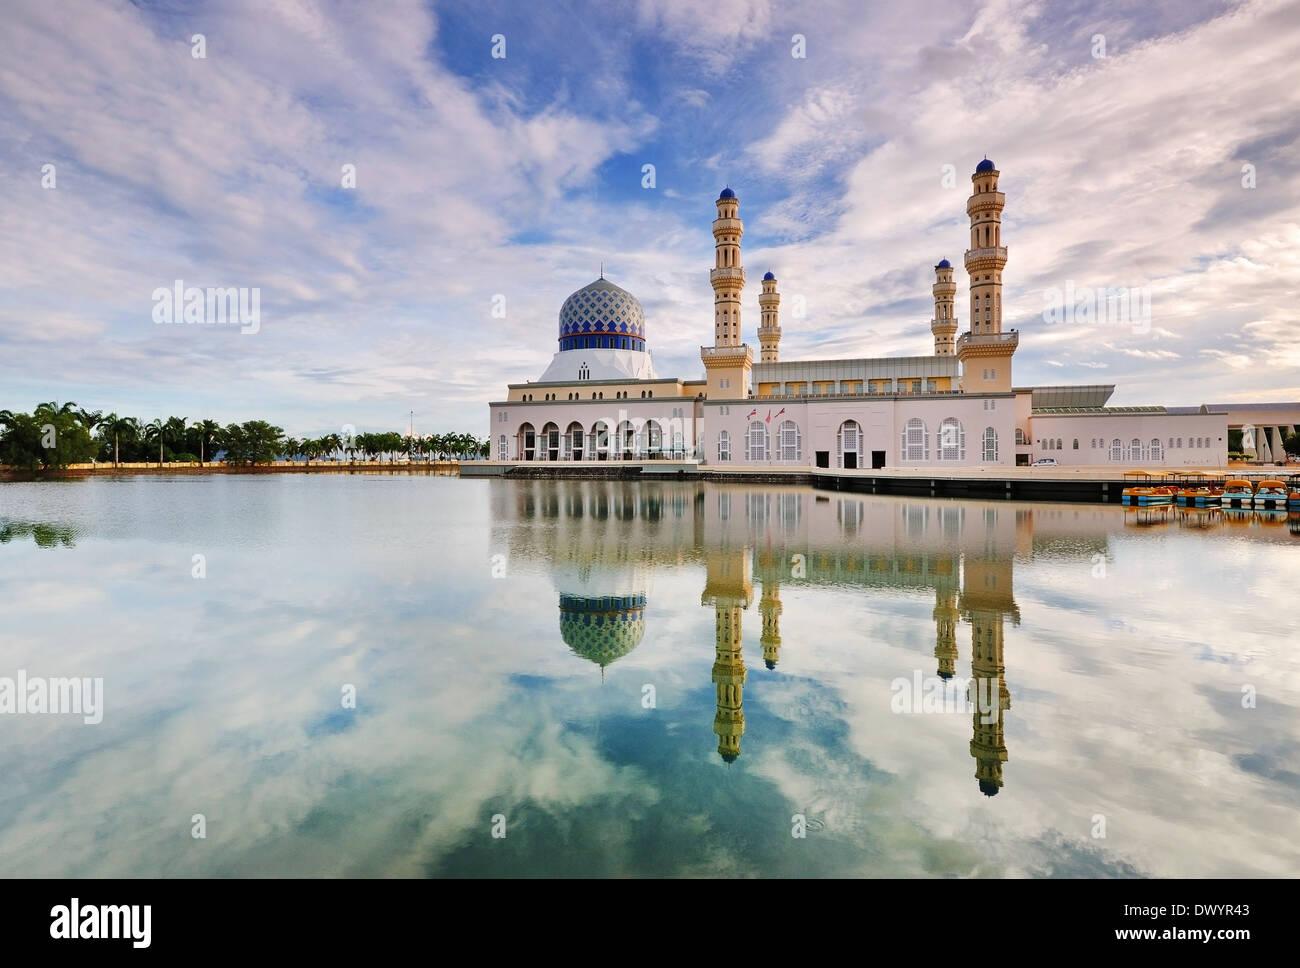 Kota Kinabalu Floating Mosque Day Time Image With Reflection Stock Photo